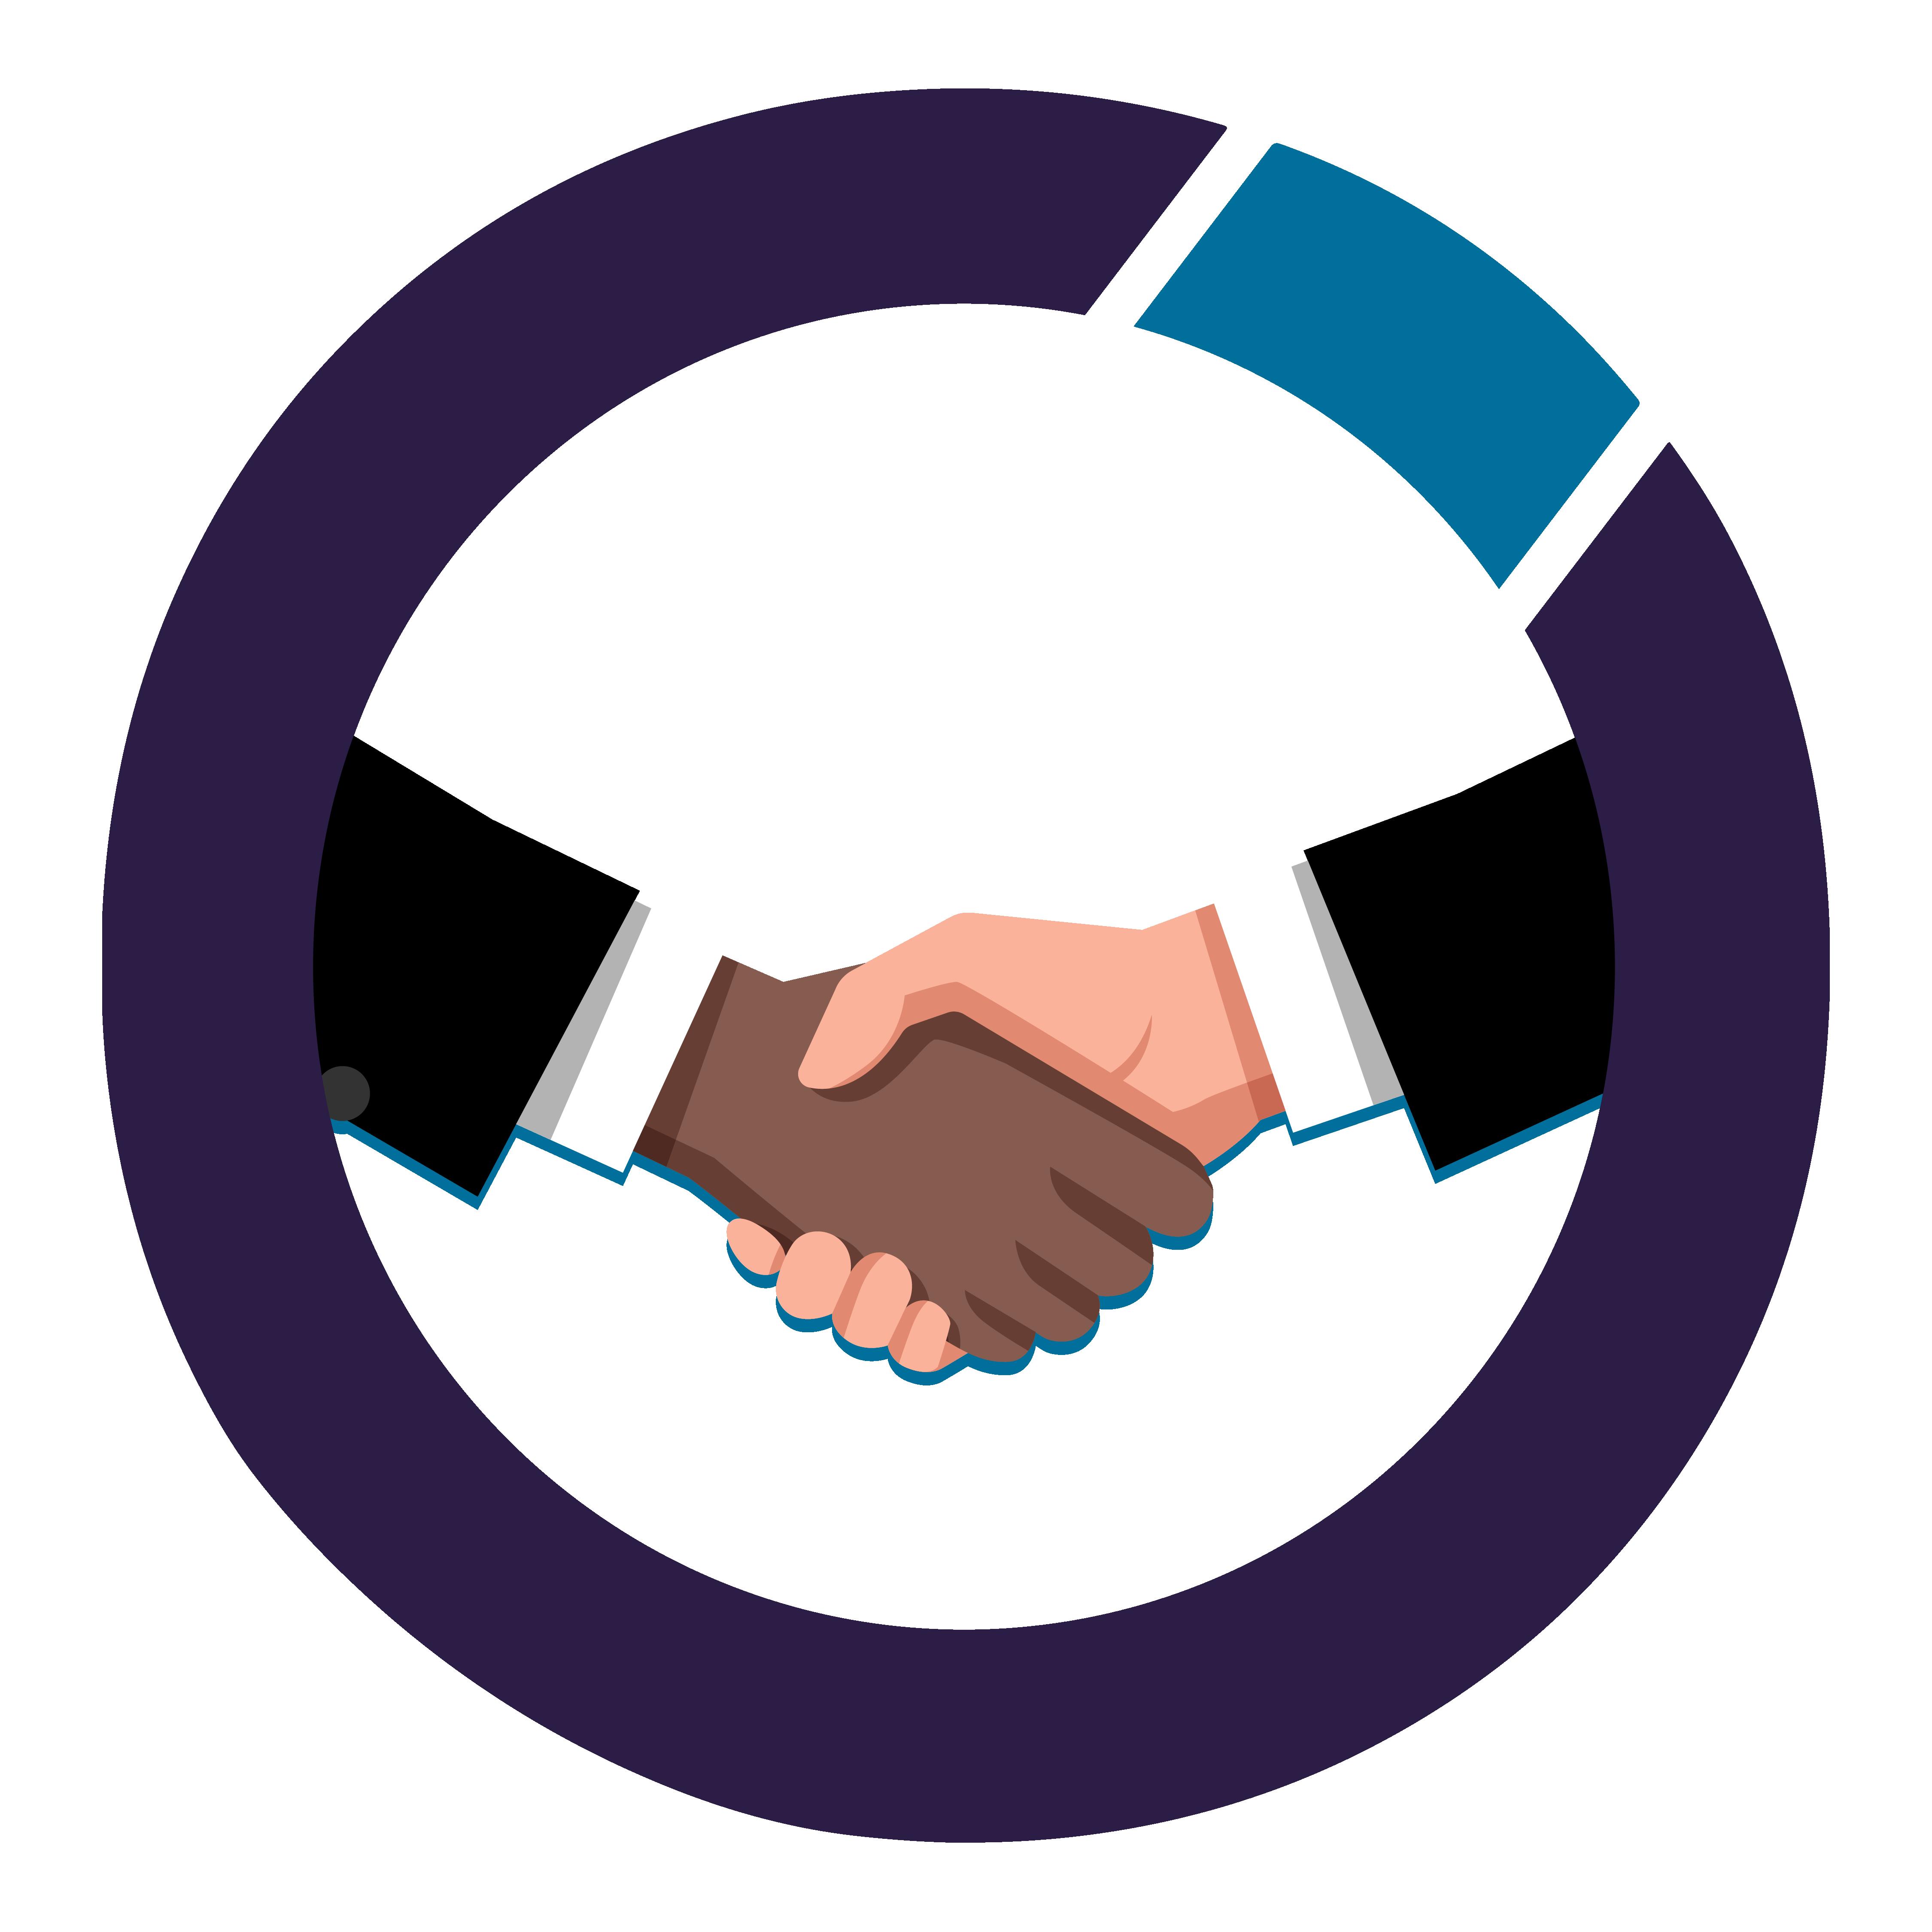 Partner-Recruitment-Icoon